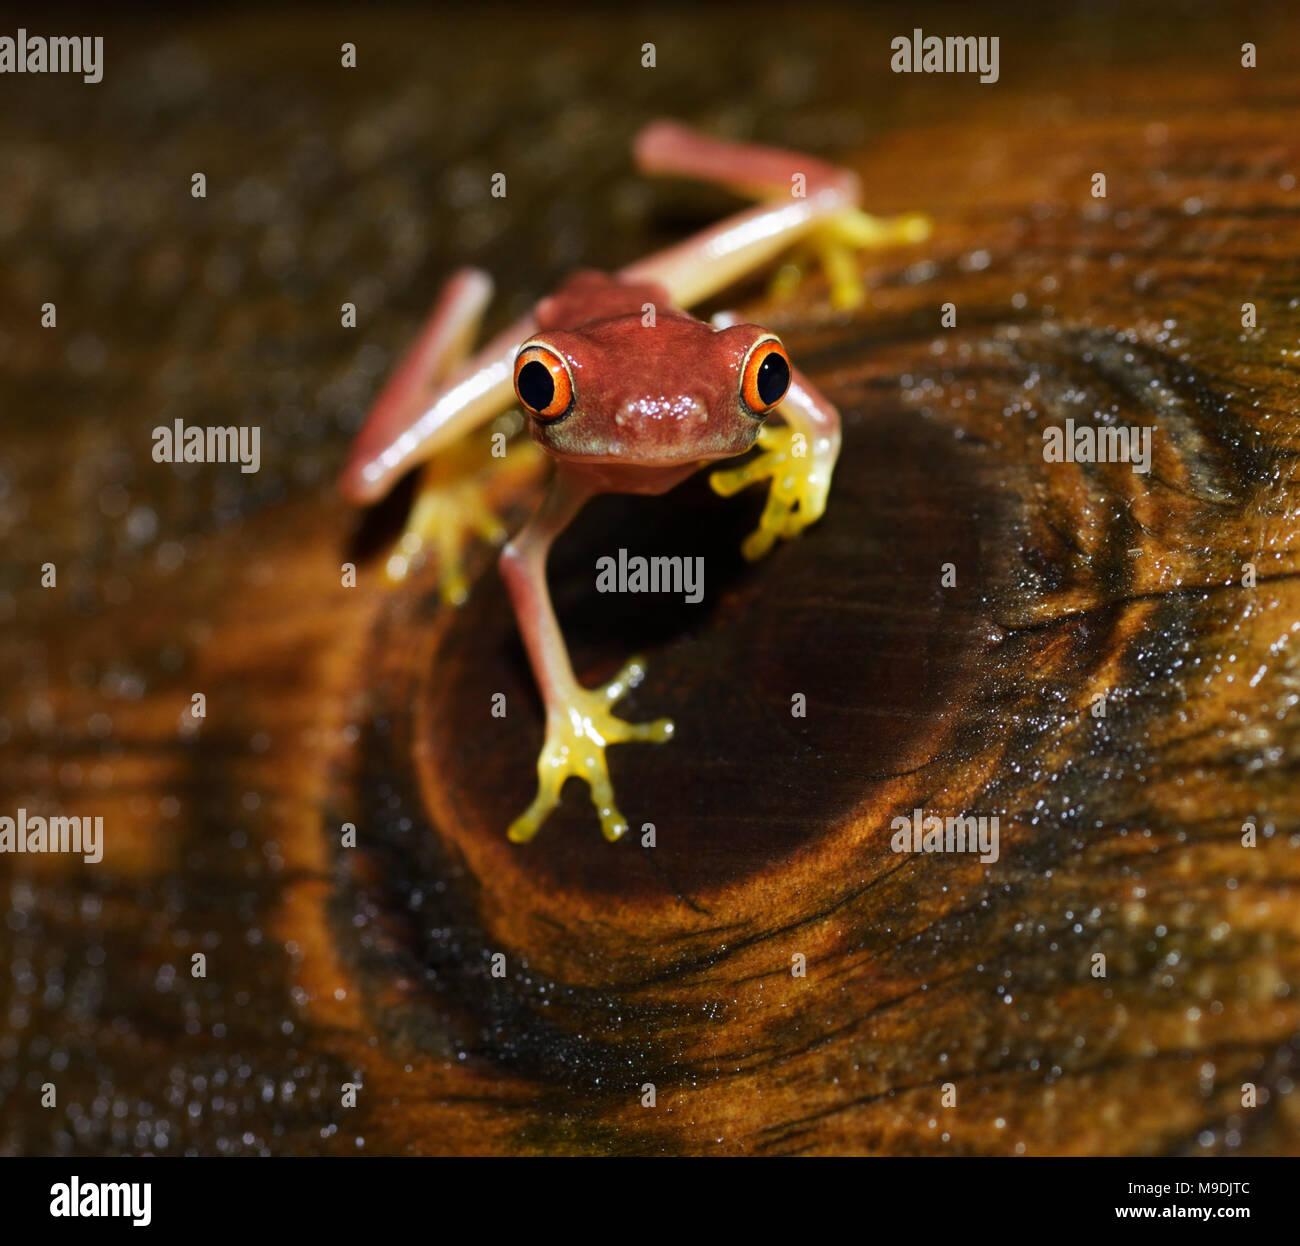 Parachuting red-eyed leaf frog, Agalychnis saltator, juvenile, Tortuguero, Costa Rica Stock Photo